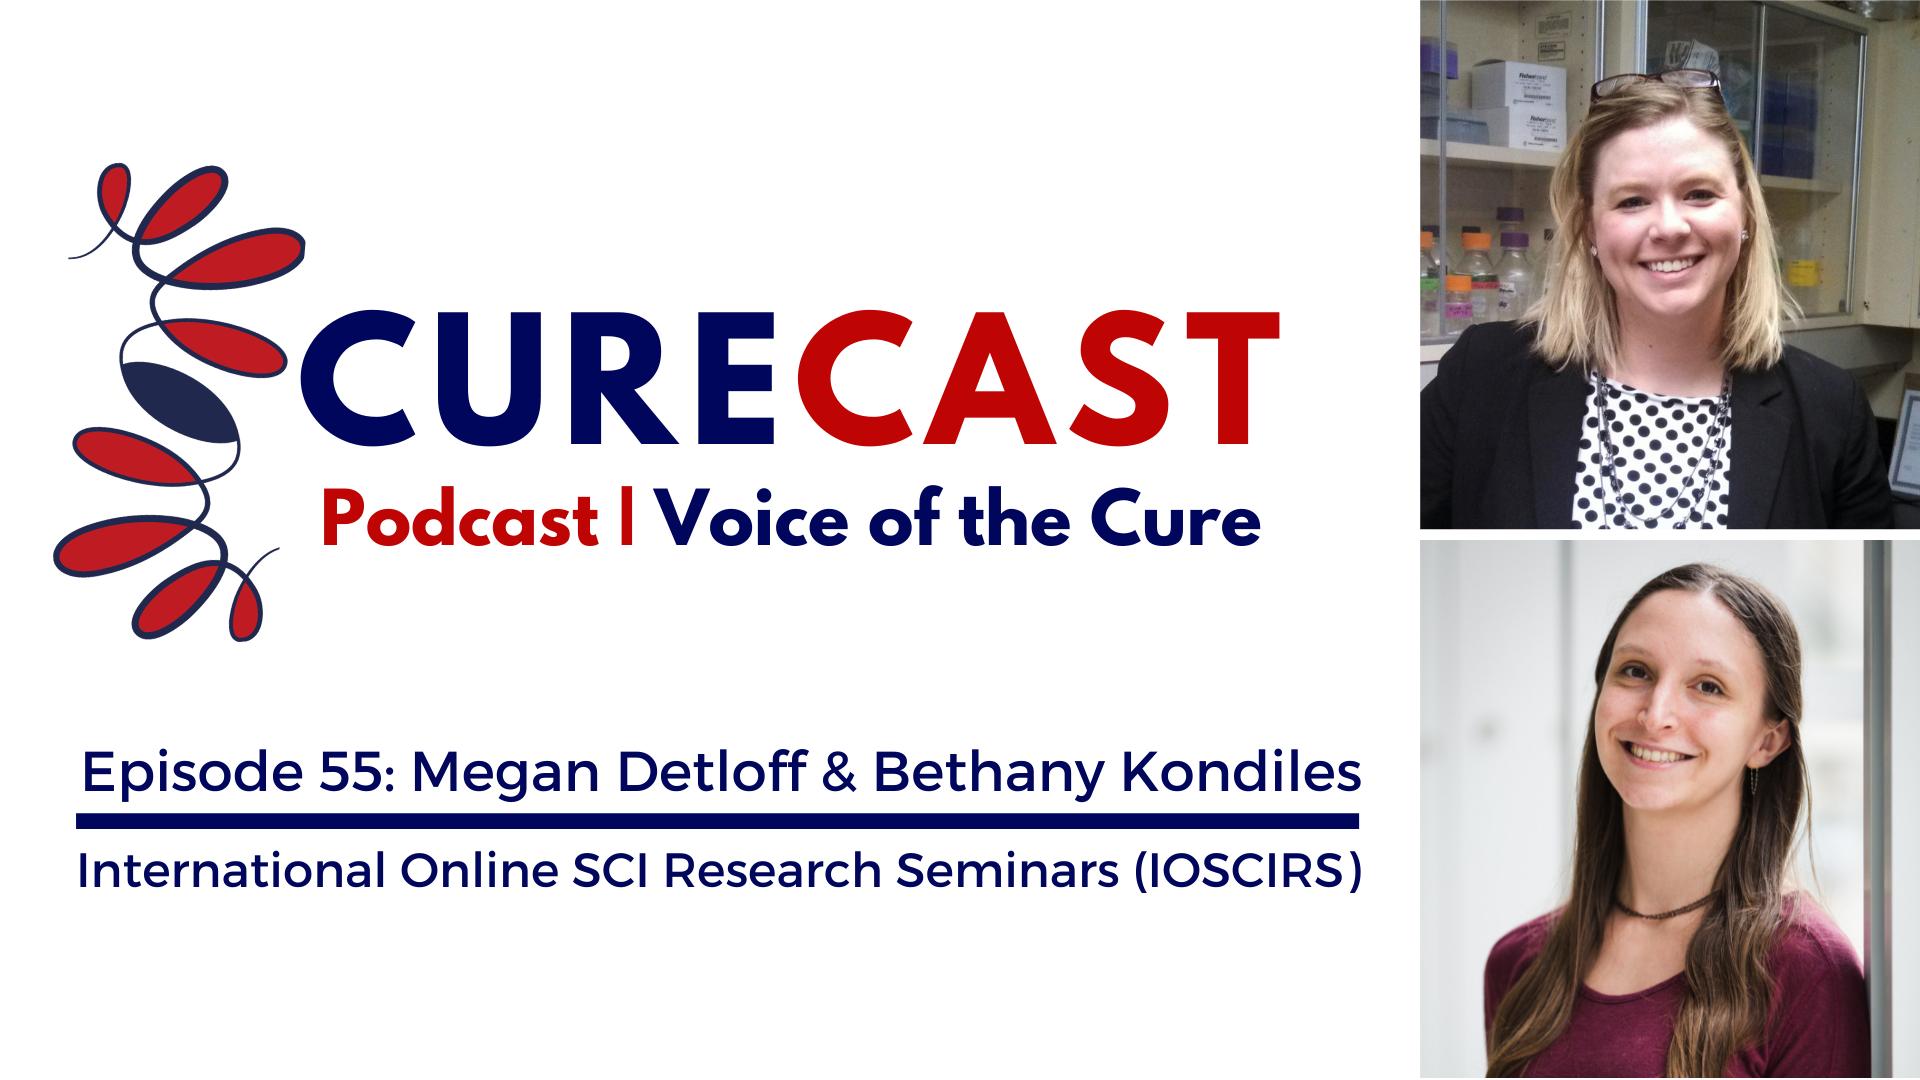 CureCast Episode 55: Megan Detloff & Bethany Kondiles of IOSCIRS